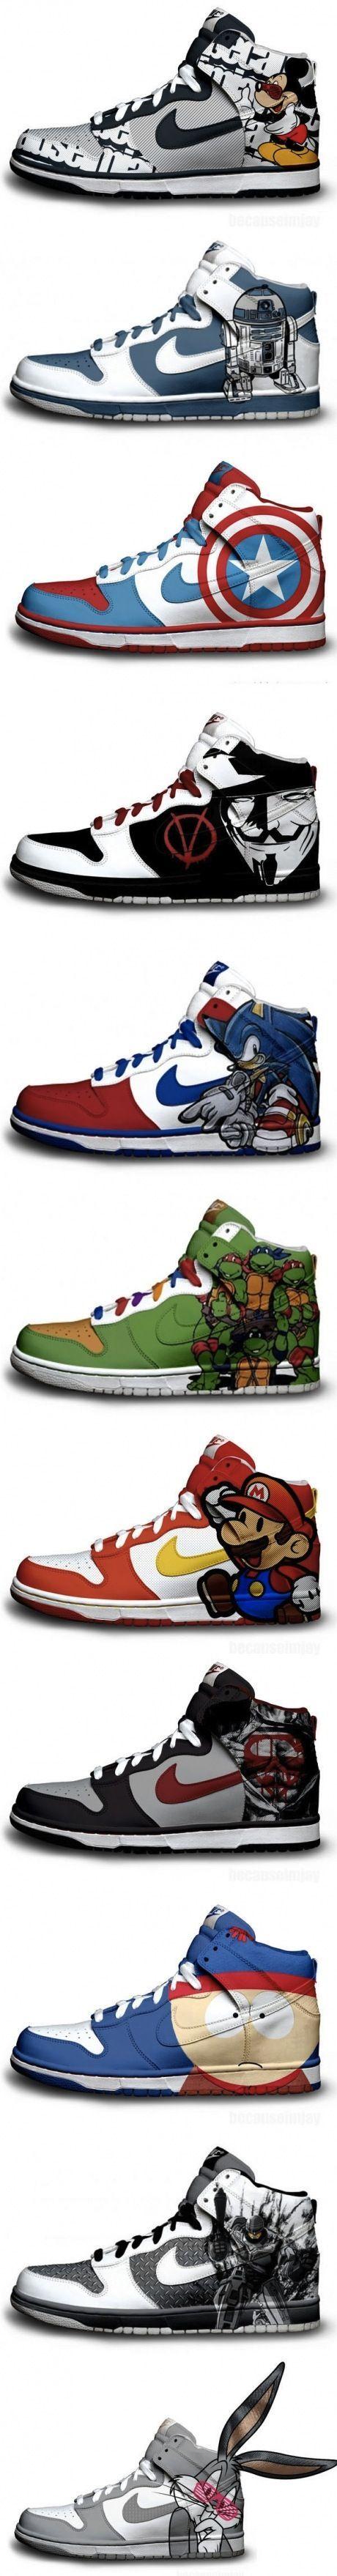 Chaussures geek